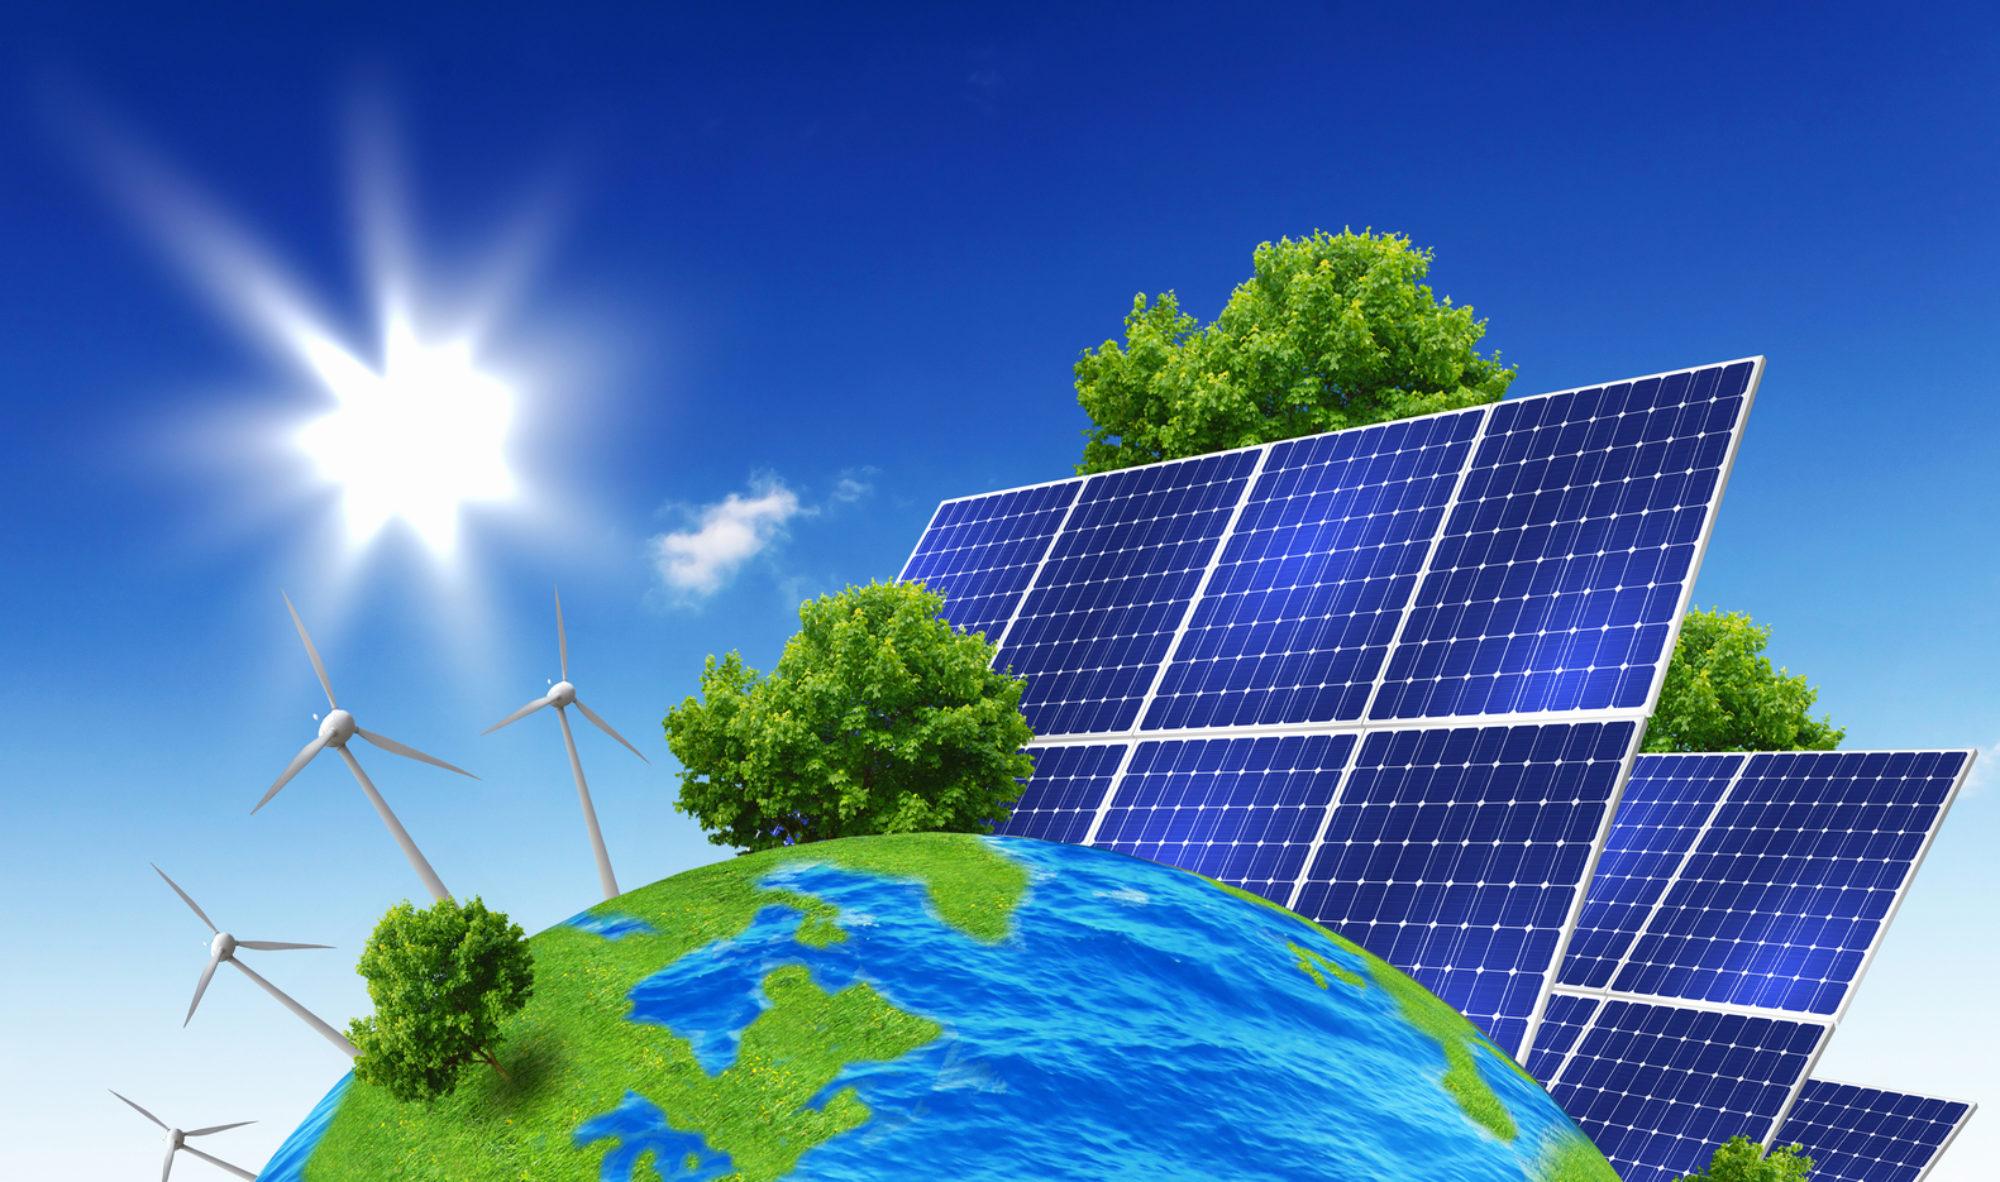 Sziget üzemű napelem rendszerek